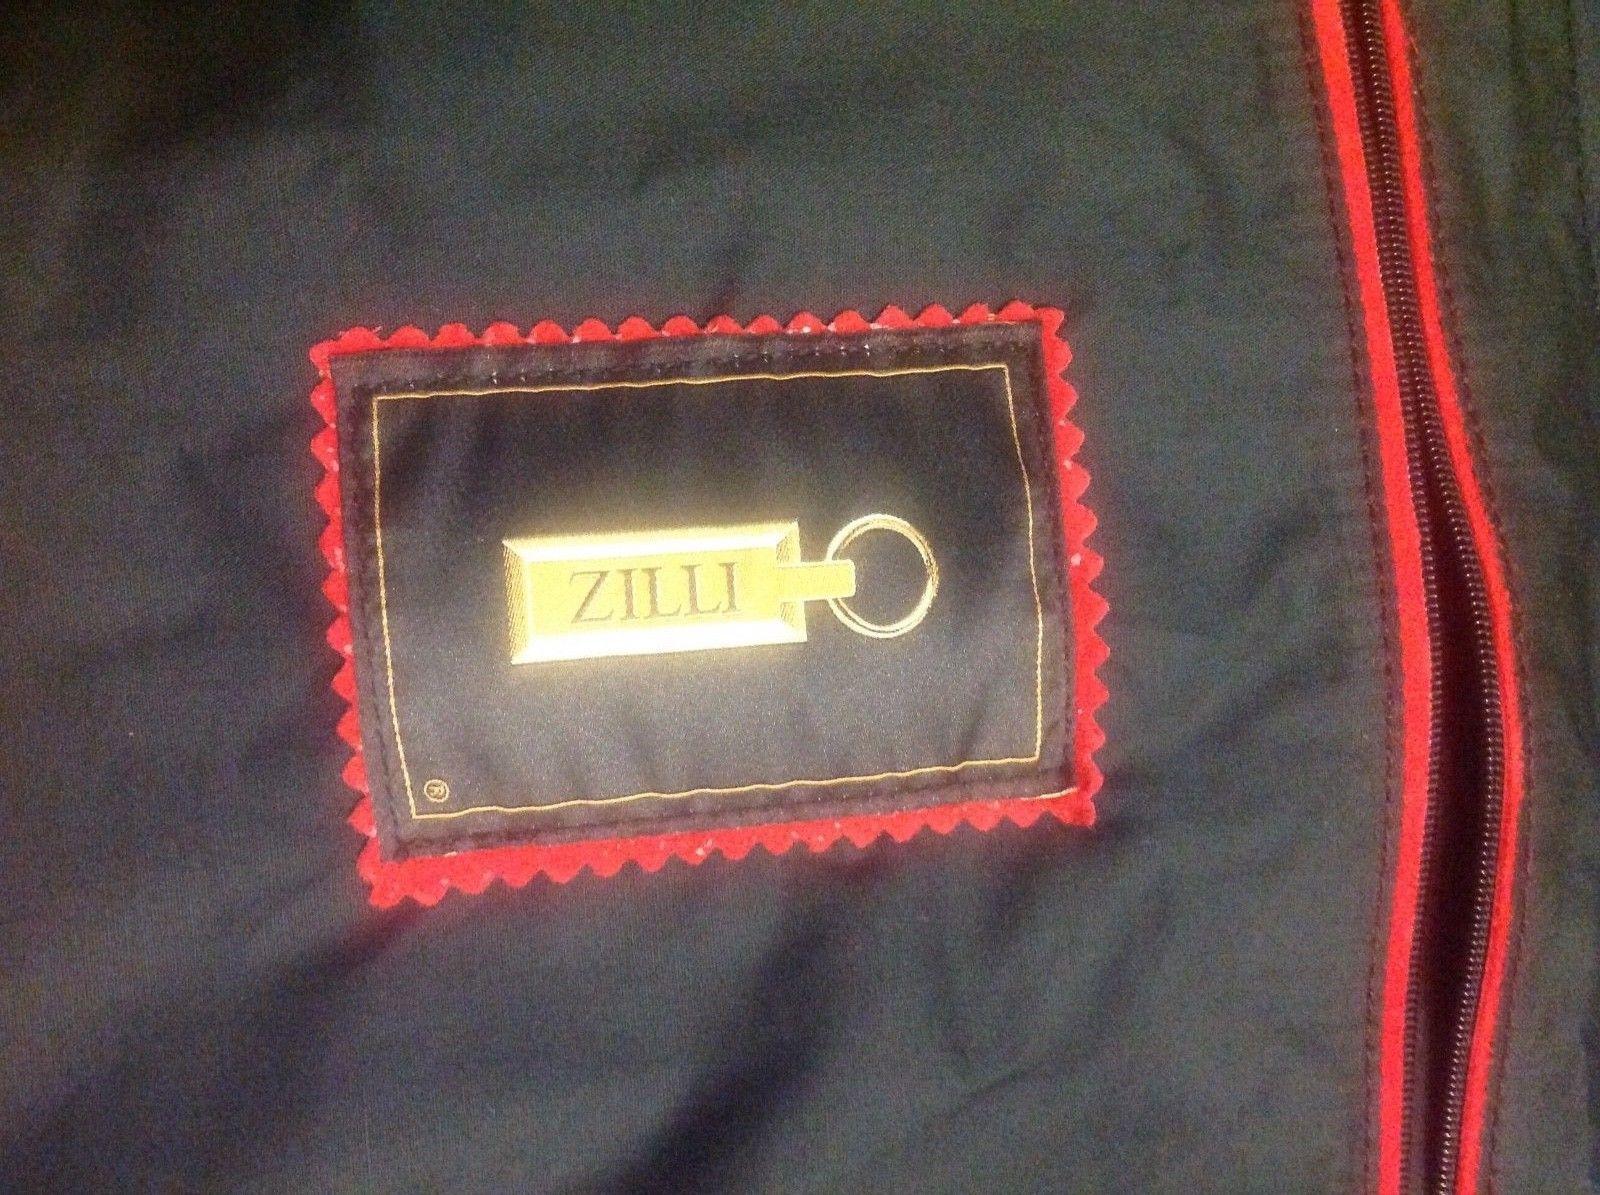 Zilli - garment bag #A - 03.jpg.jpg